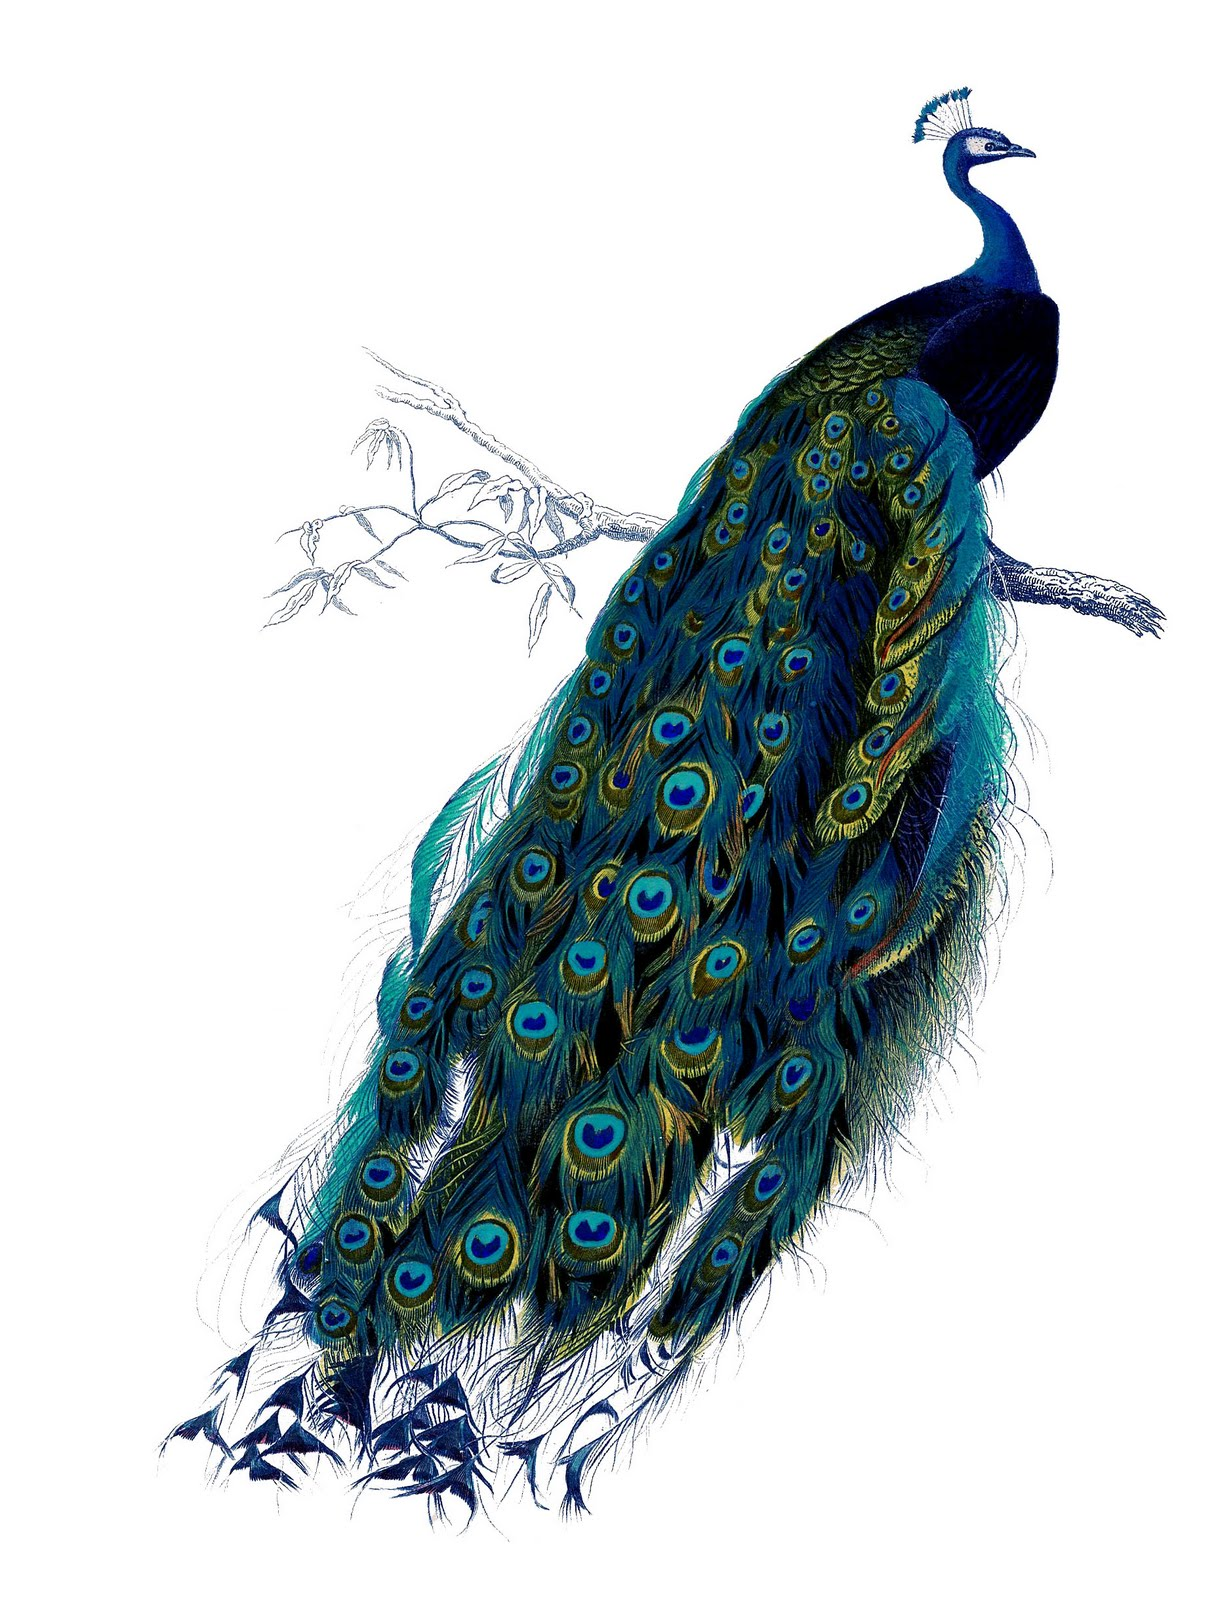 peacock+vintage+image--graphicsfairy15 (1).jpg